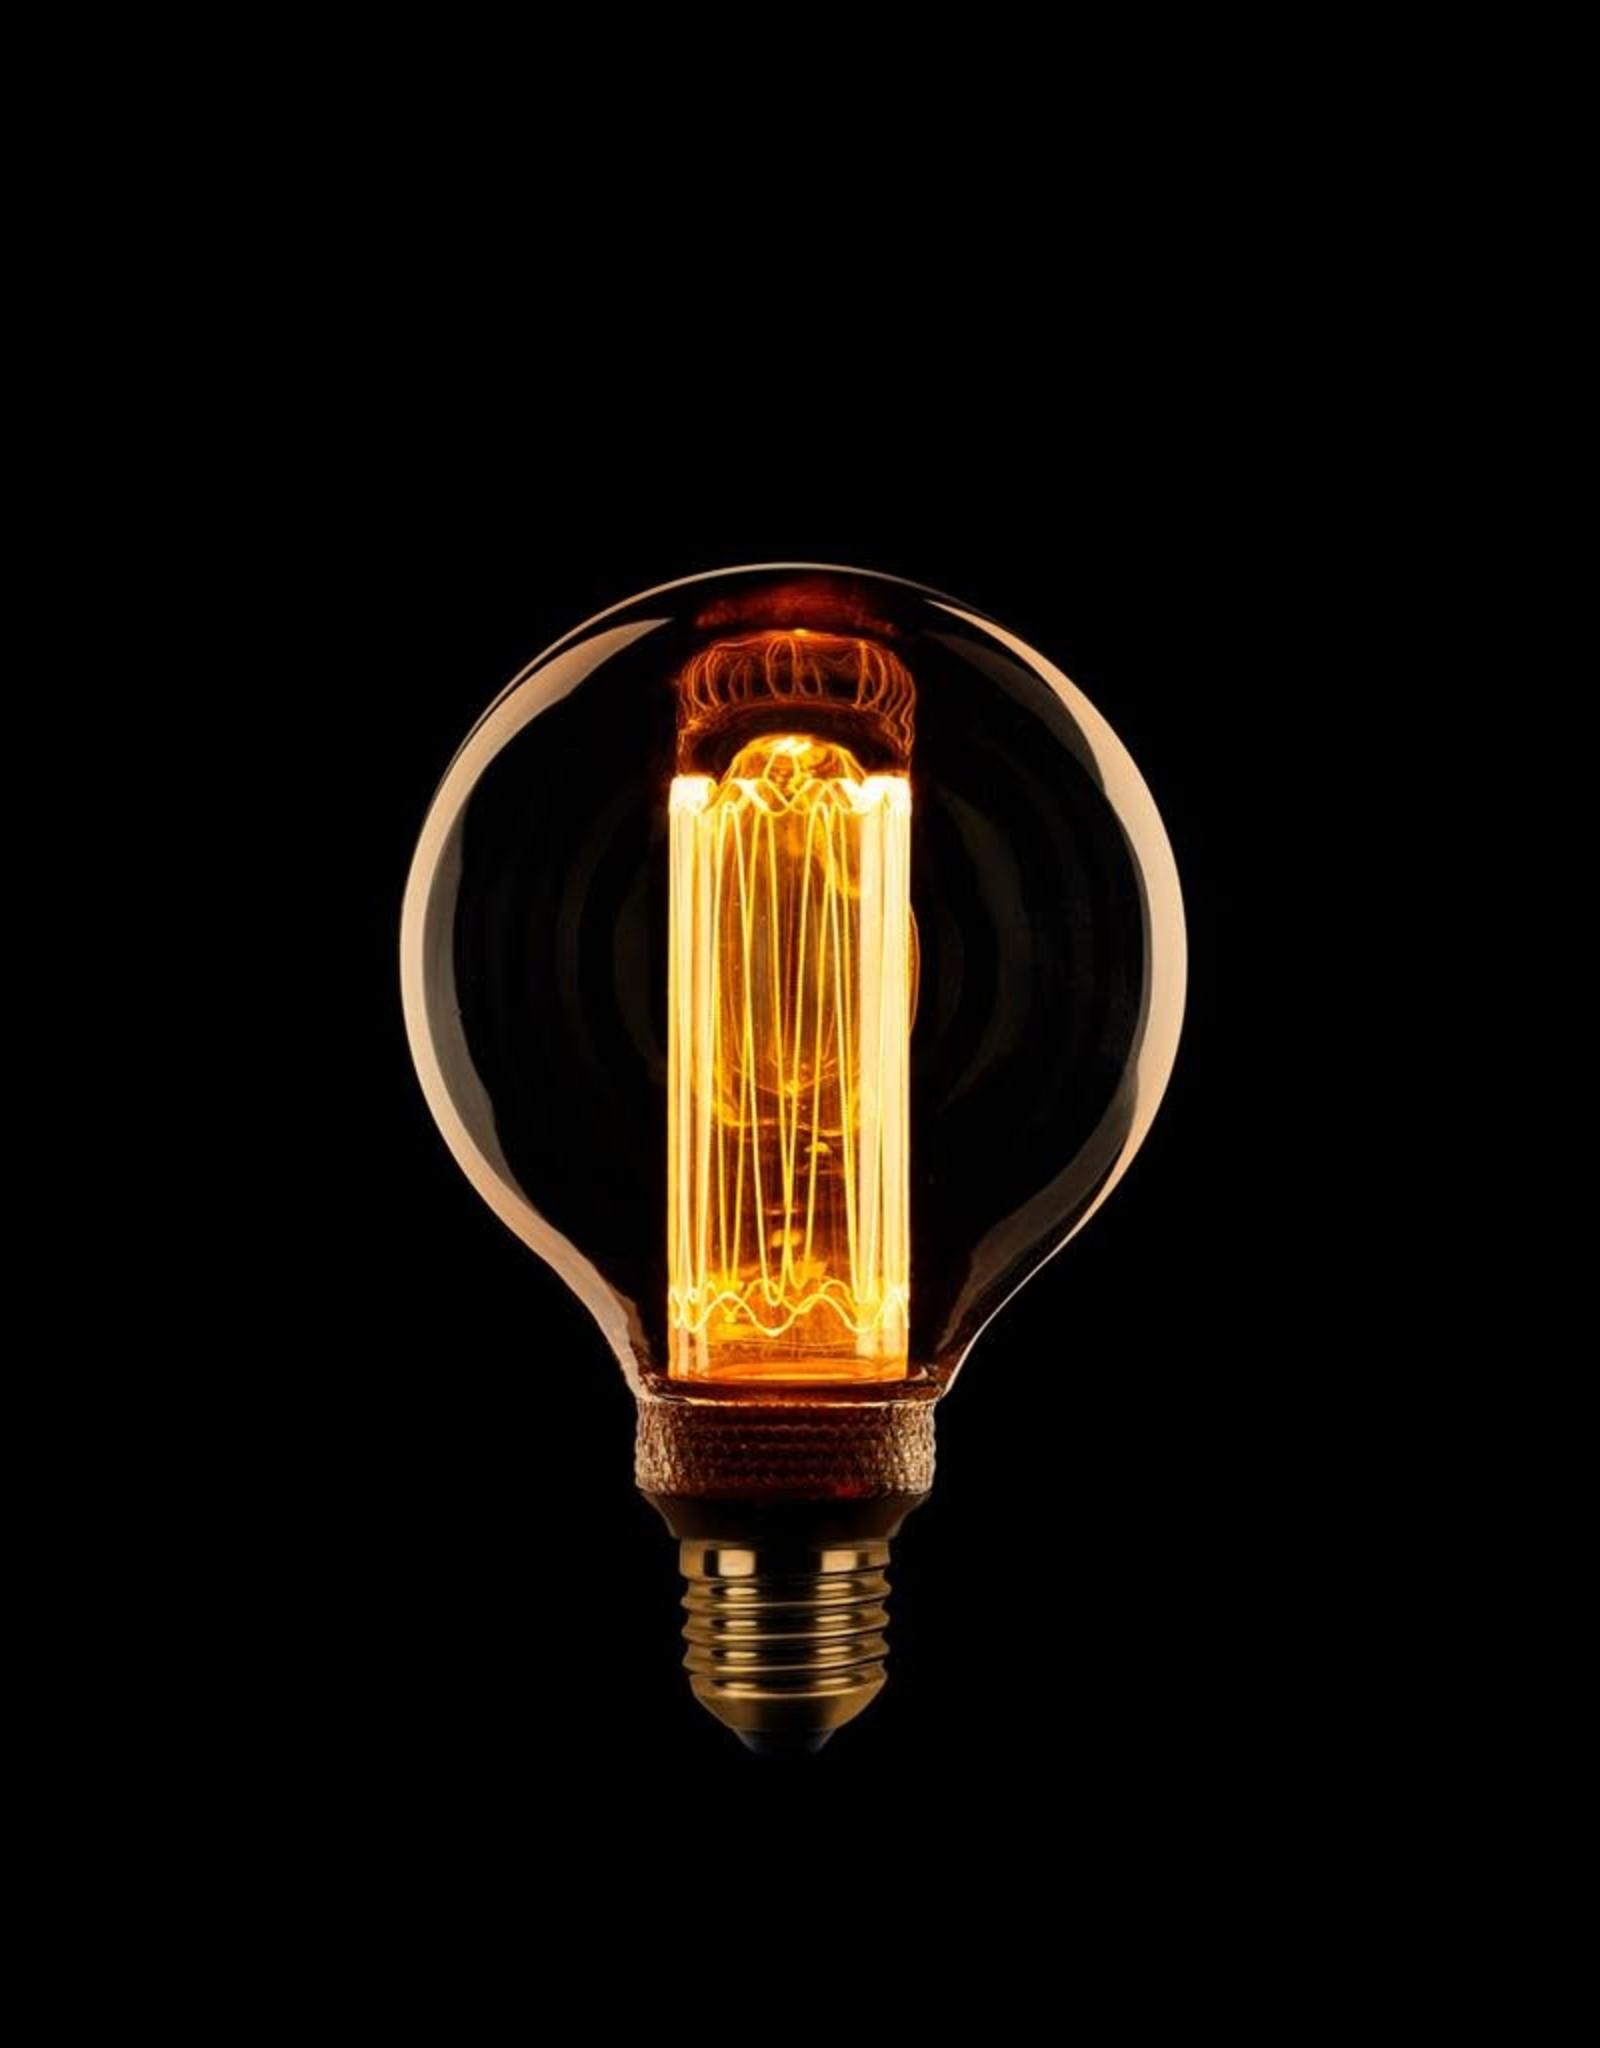 Lamp LED kooldraad dimbaar - Globe 80mm E27